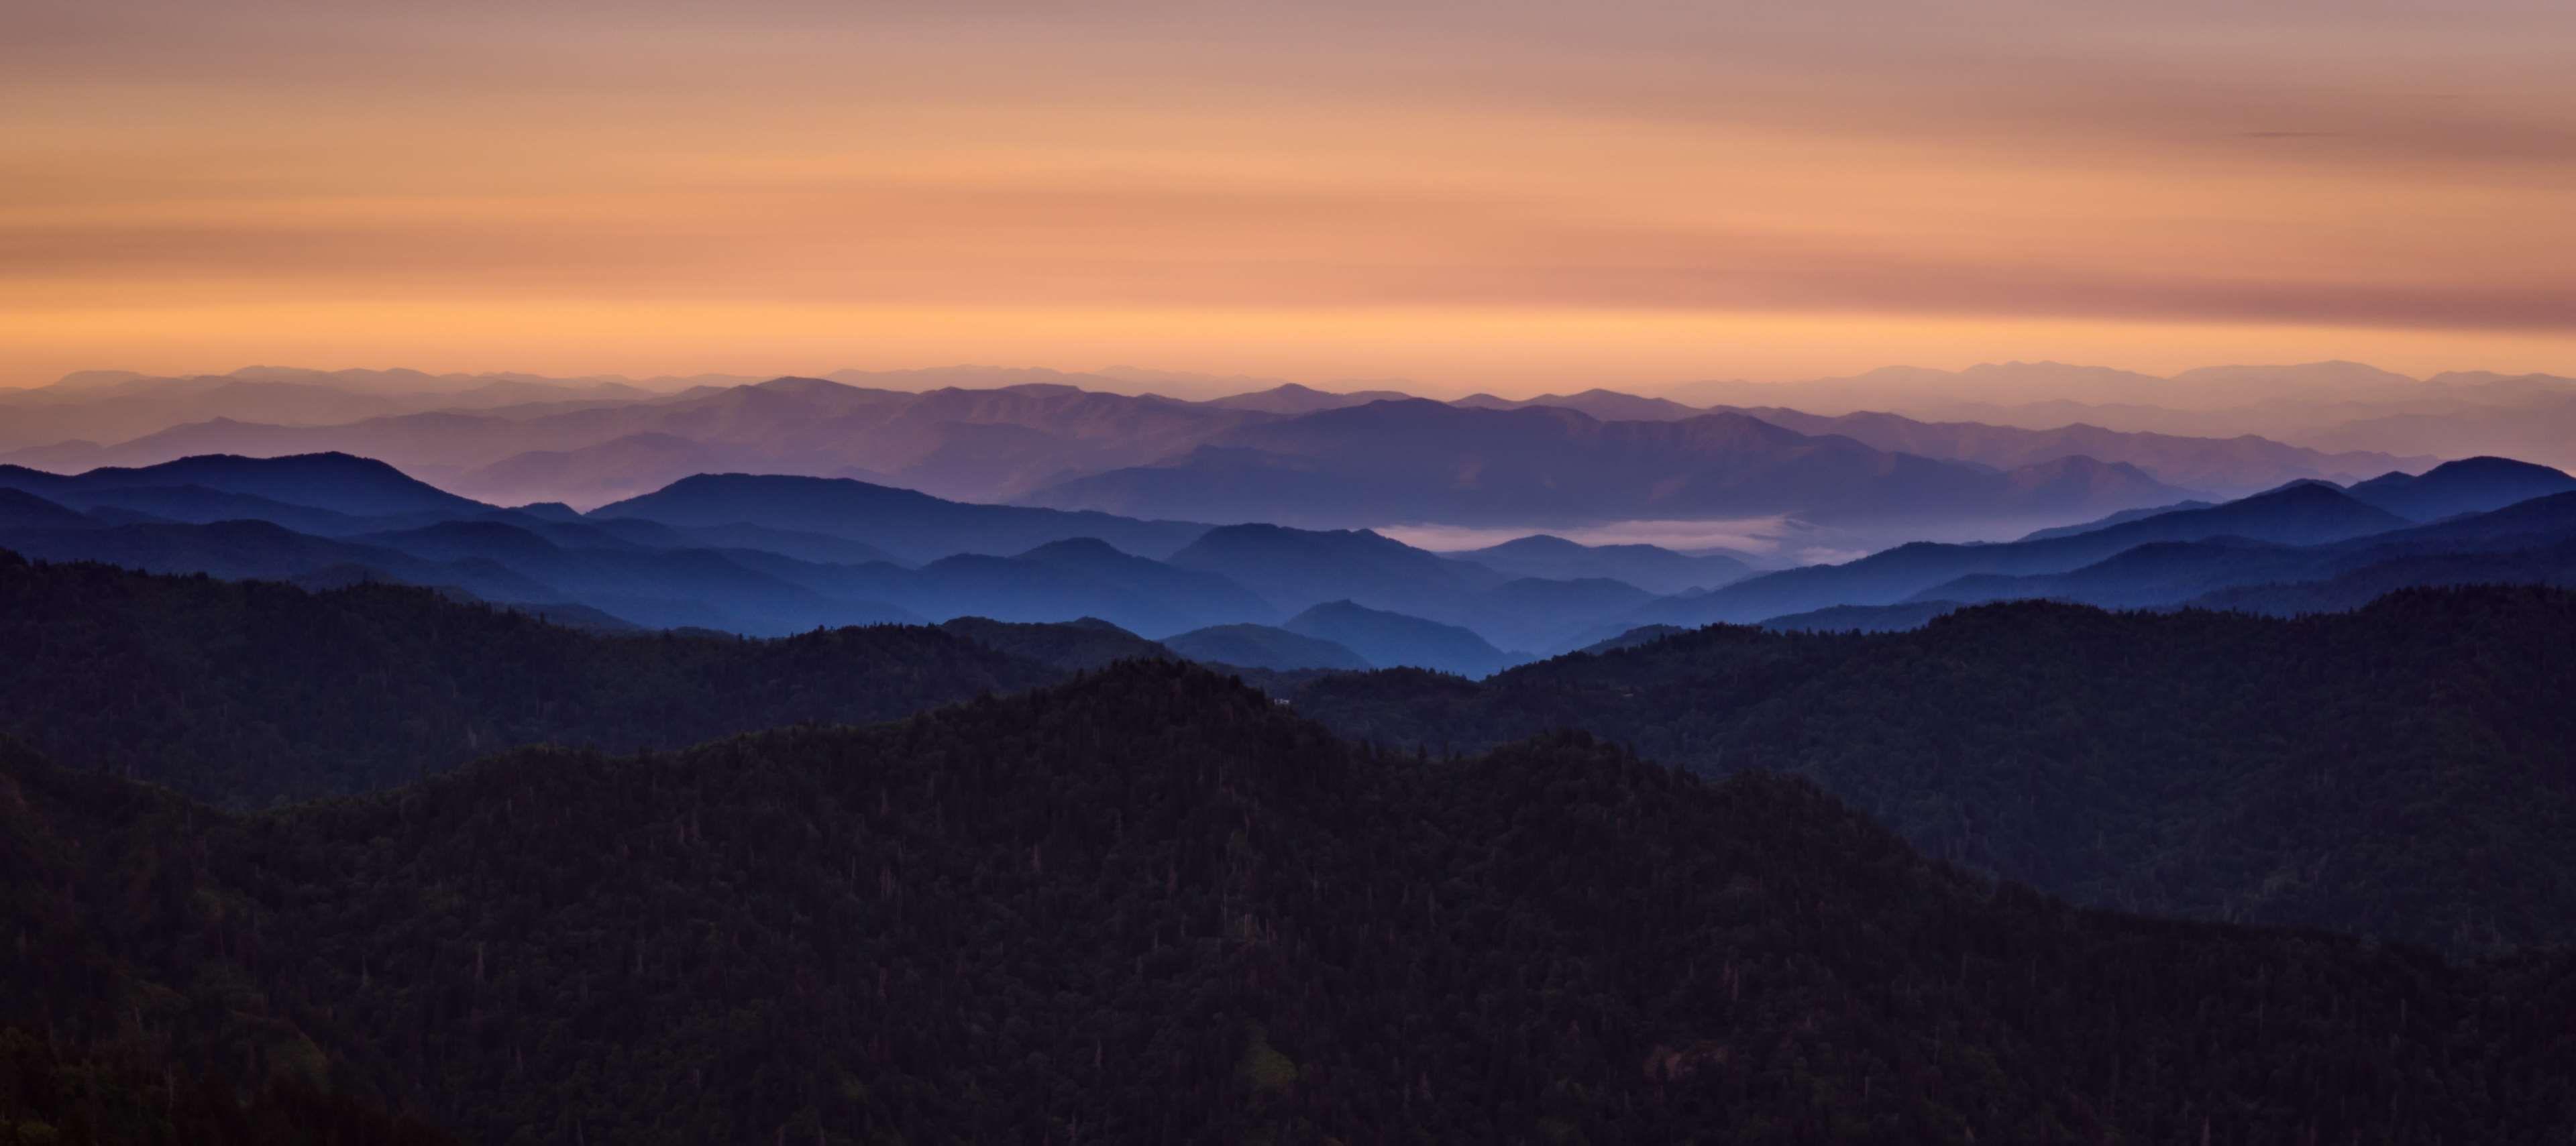 Dawn Fog Landscape Mountain Range Mountains Nature Panoramic Scenic Sky Scenic Landscape Photography Tutorial Landscape Photography